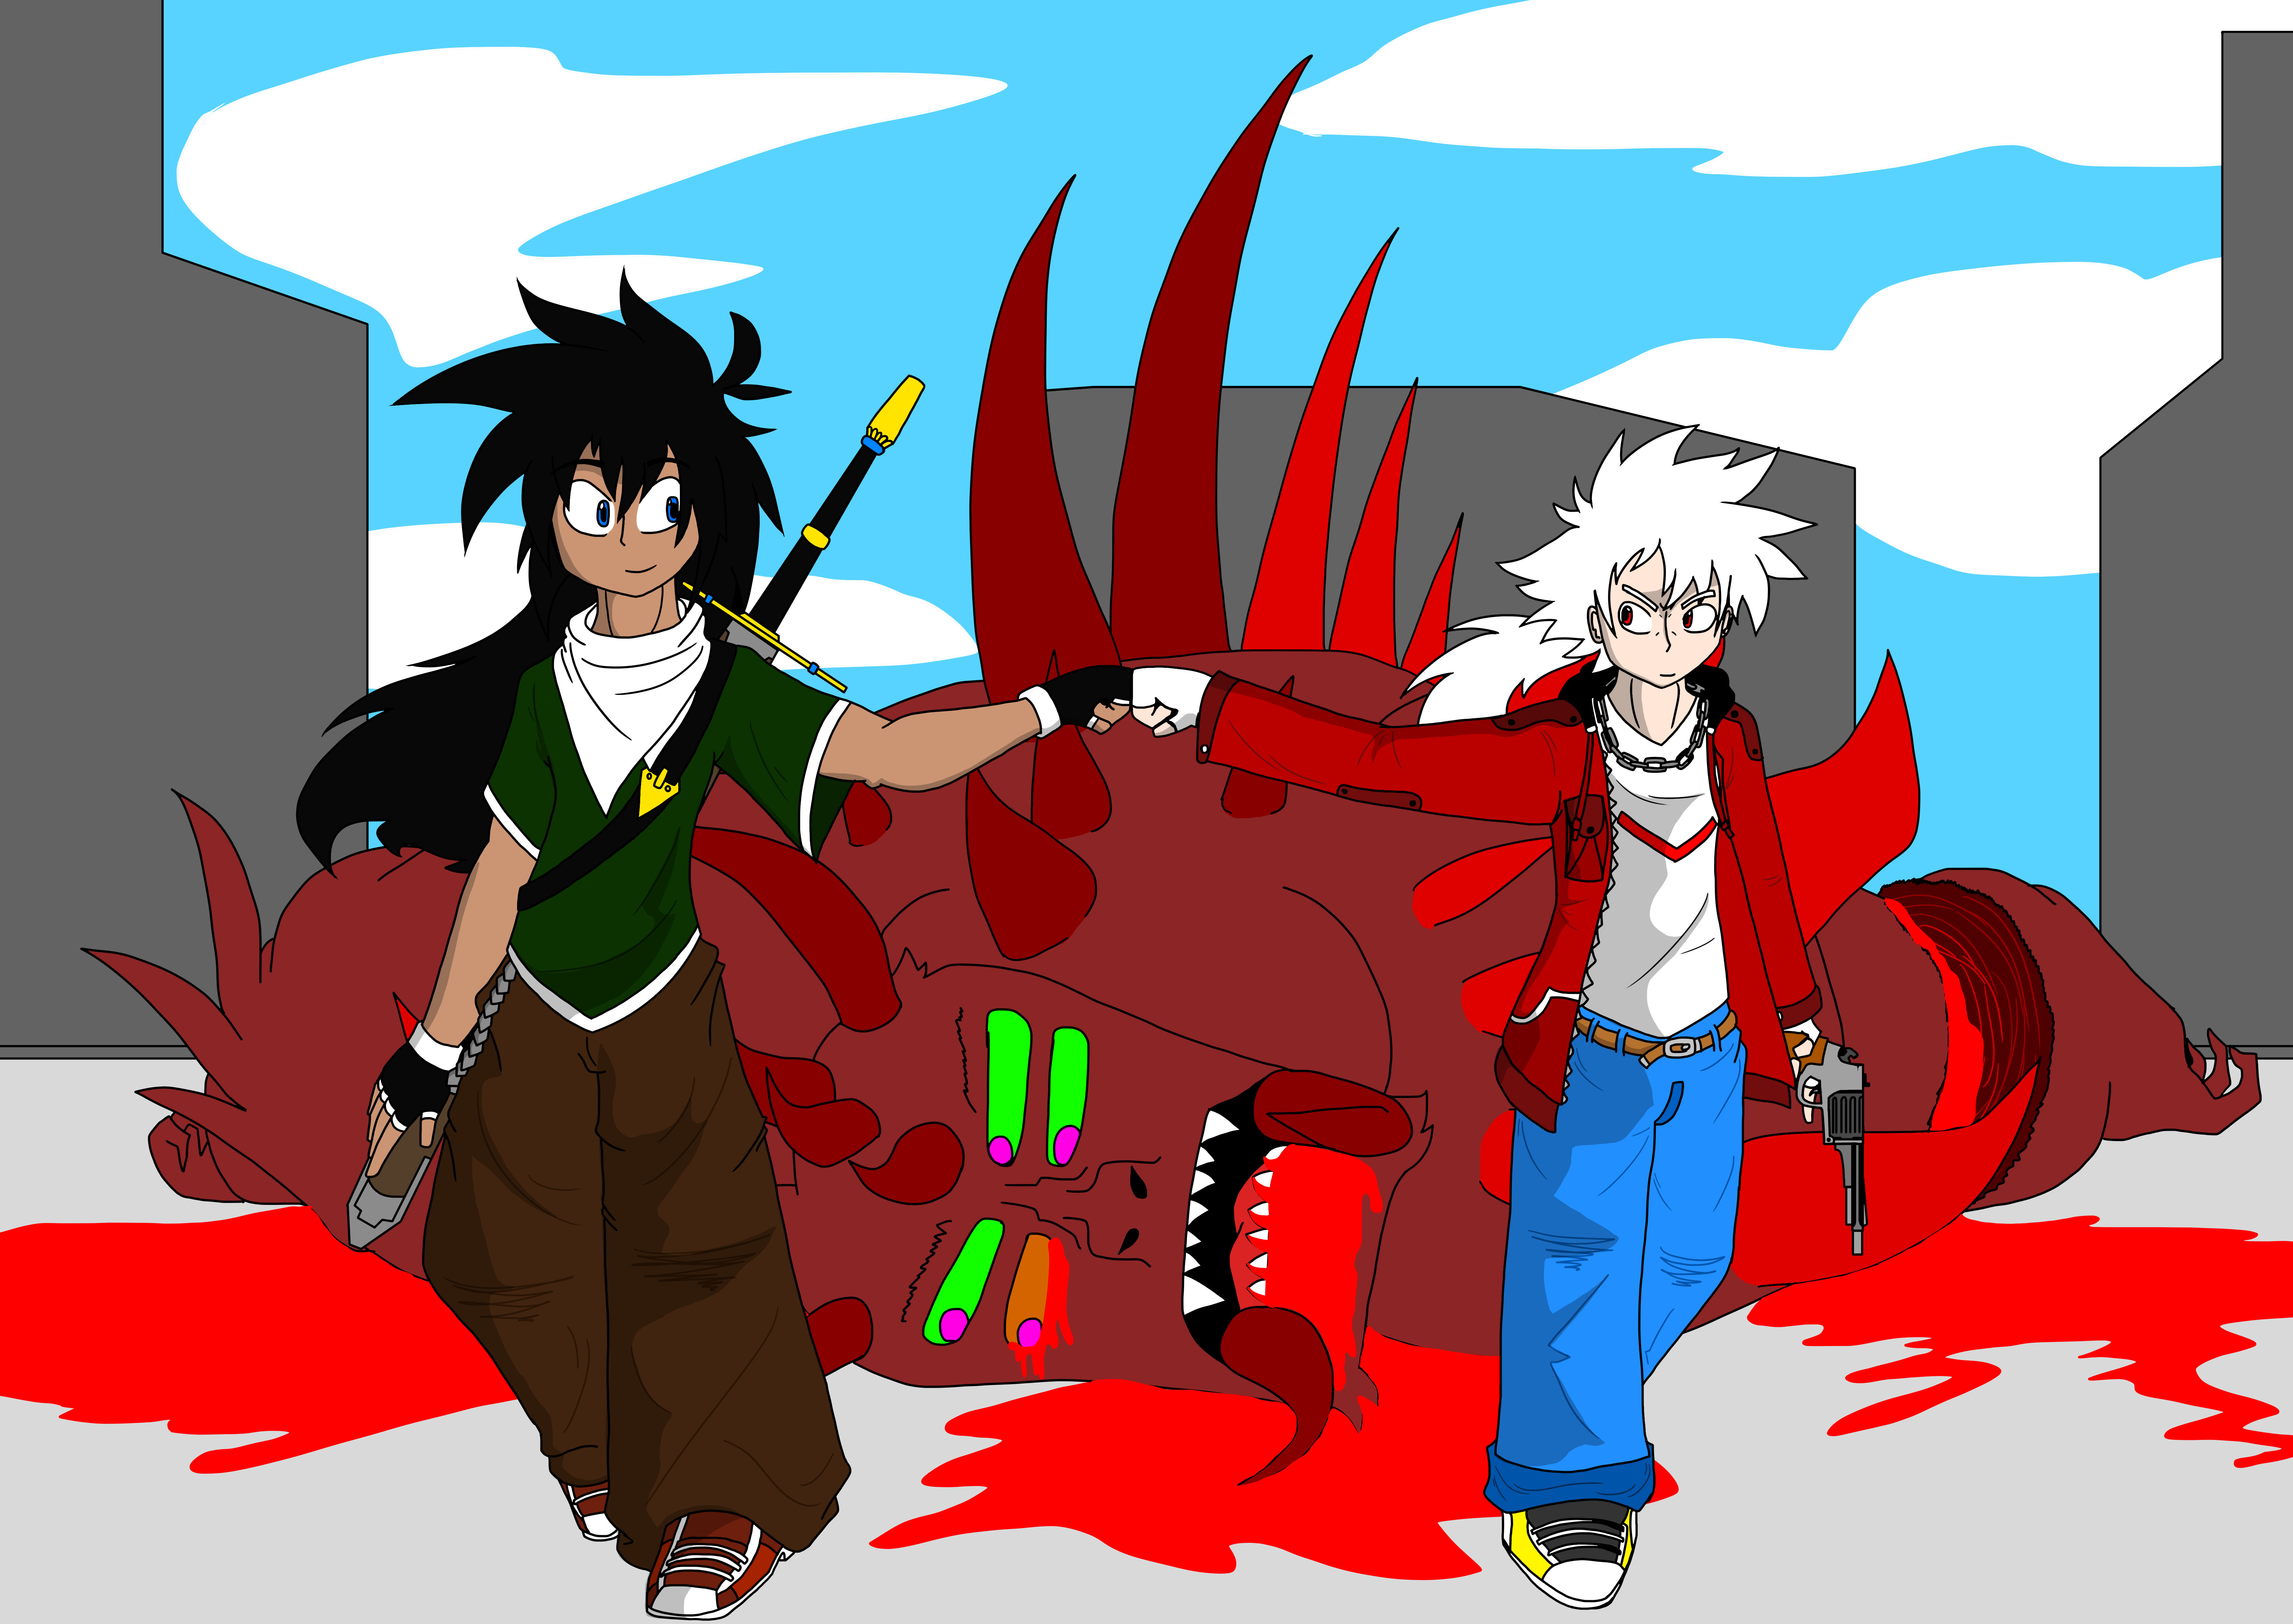 Domon and Zero_Monster_Blood